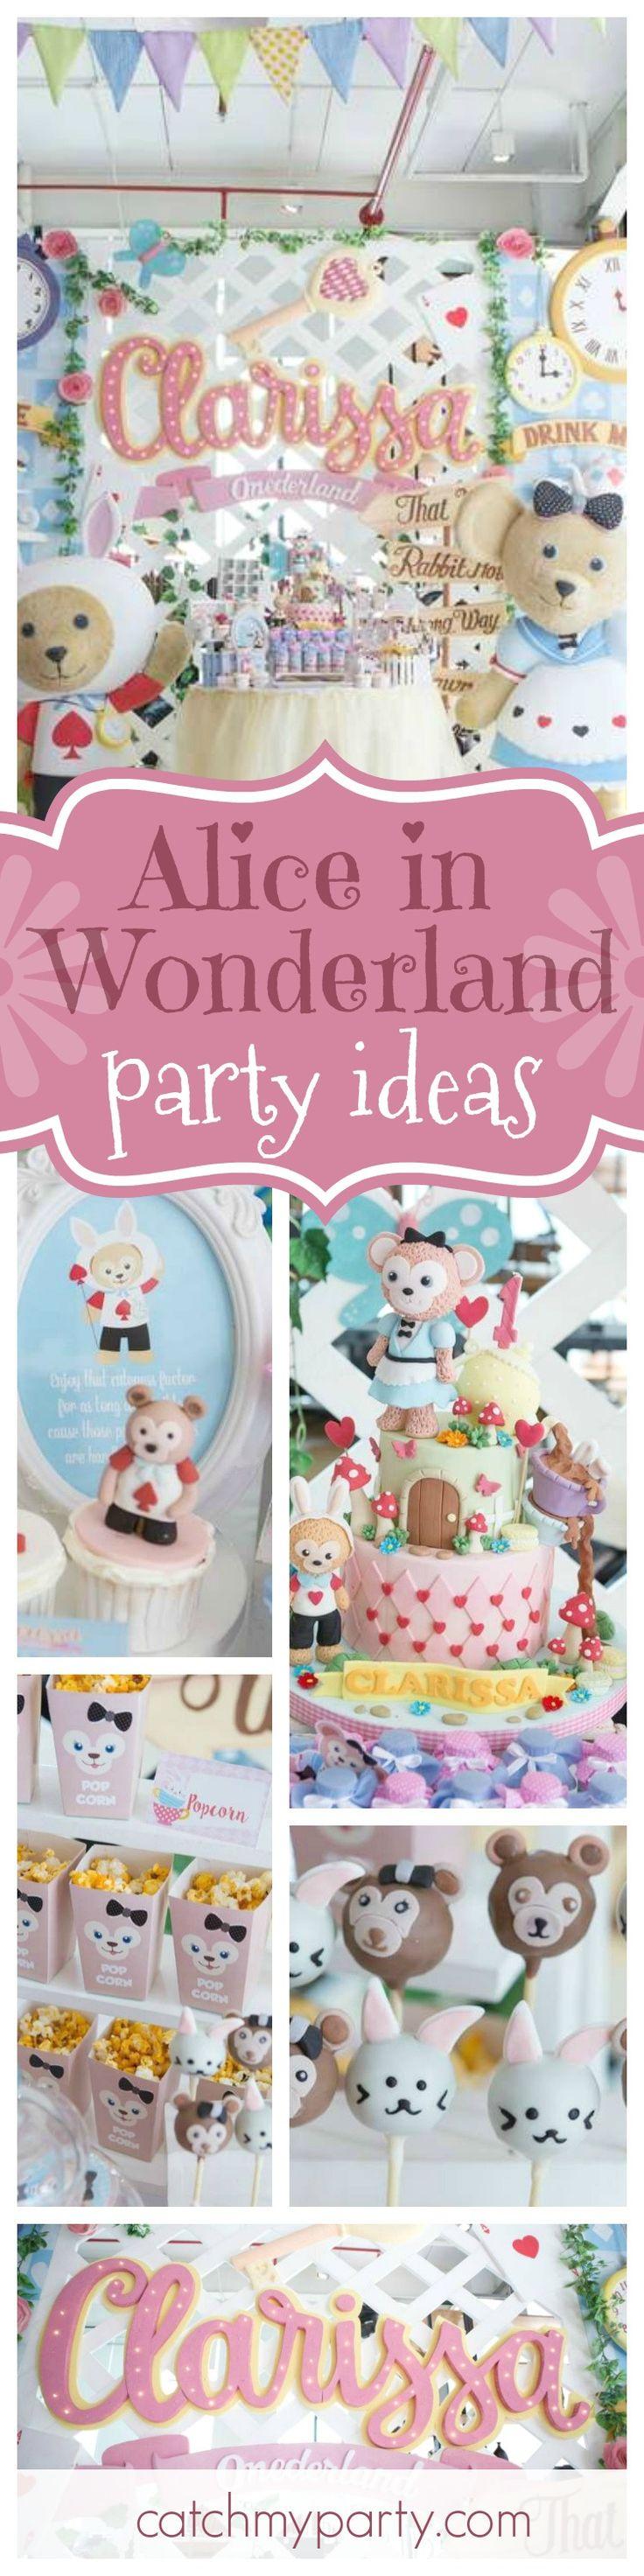 Alice in Wonderland Birthday Its duffy